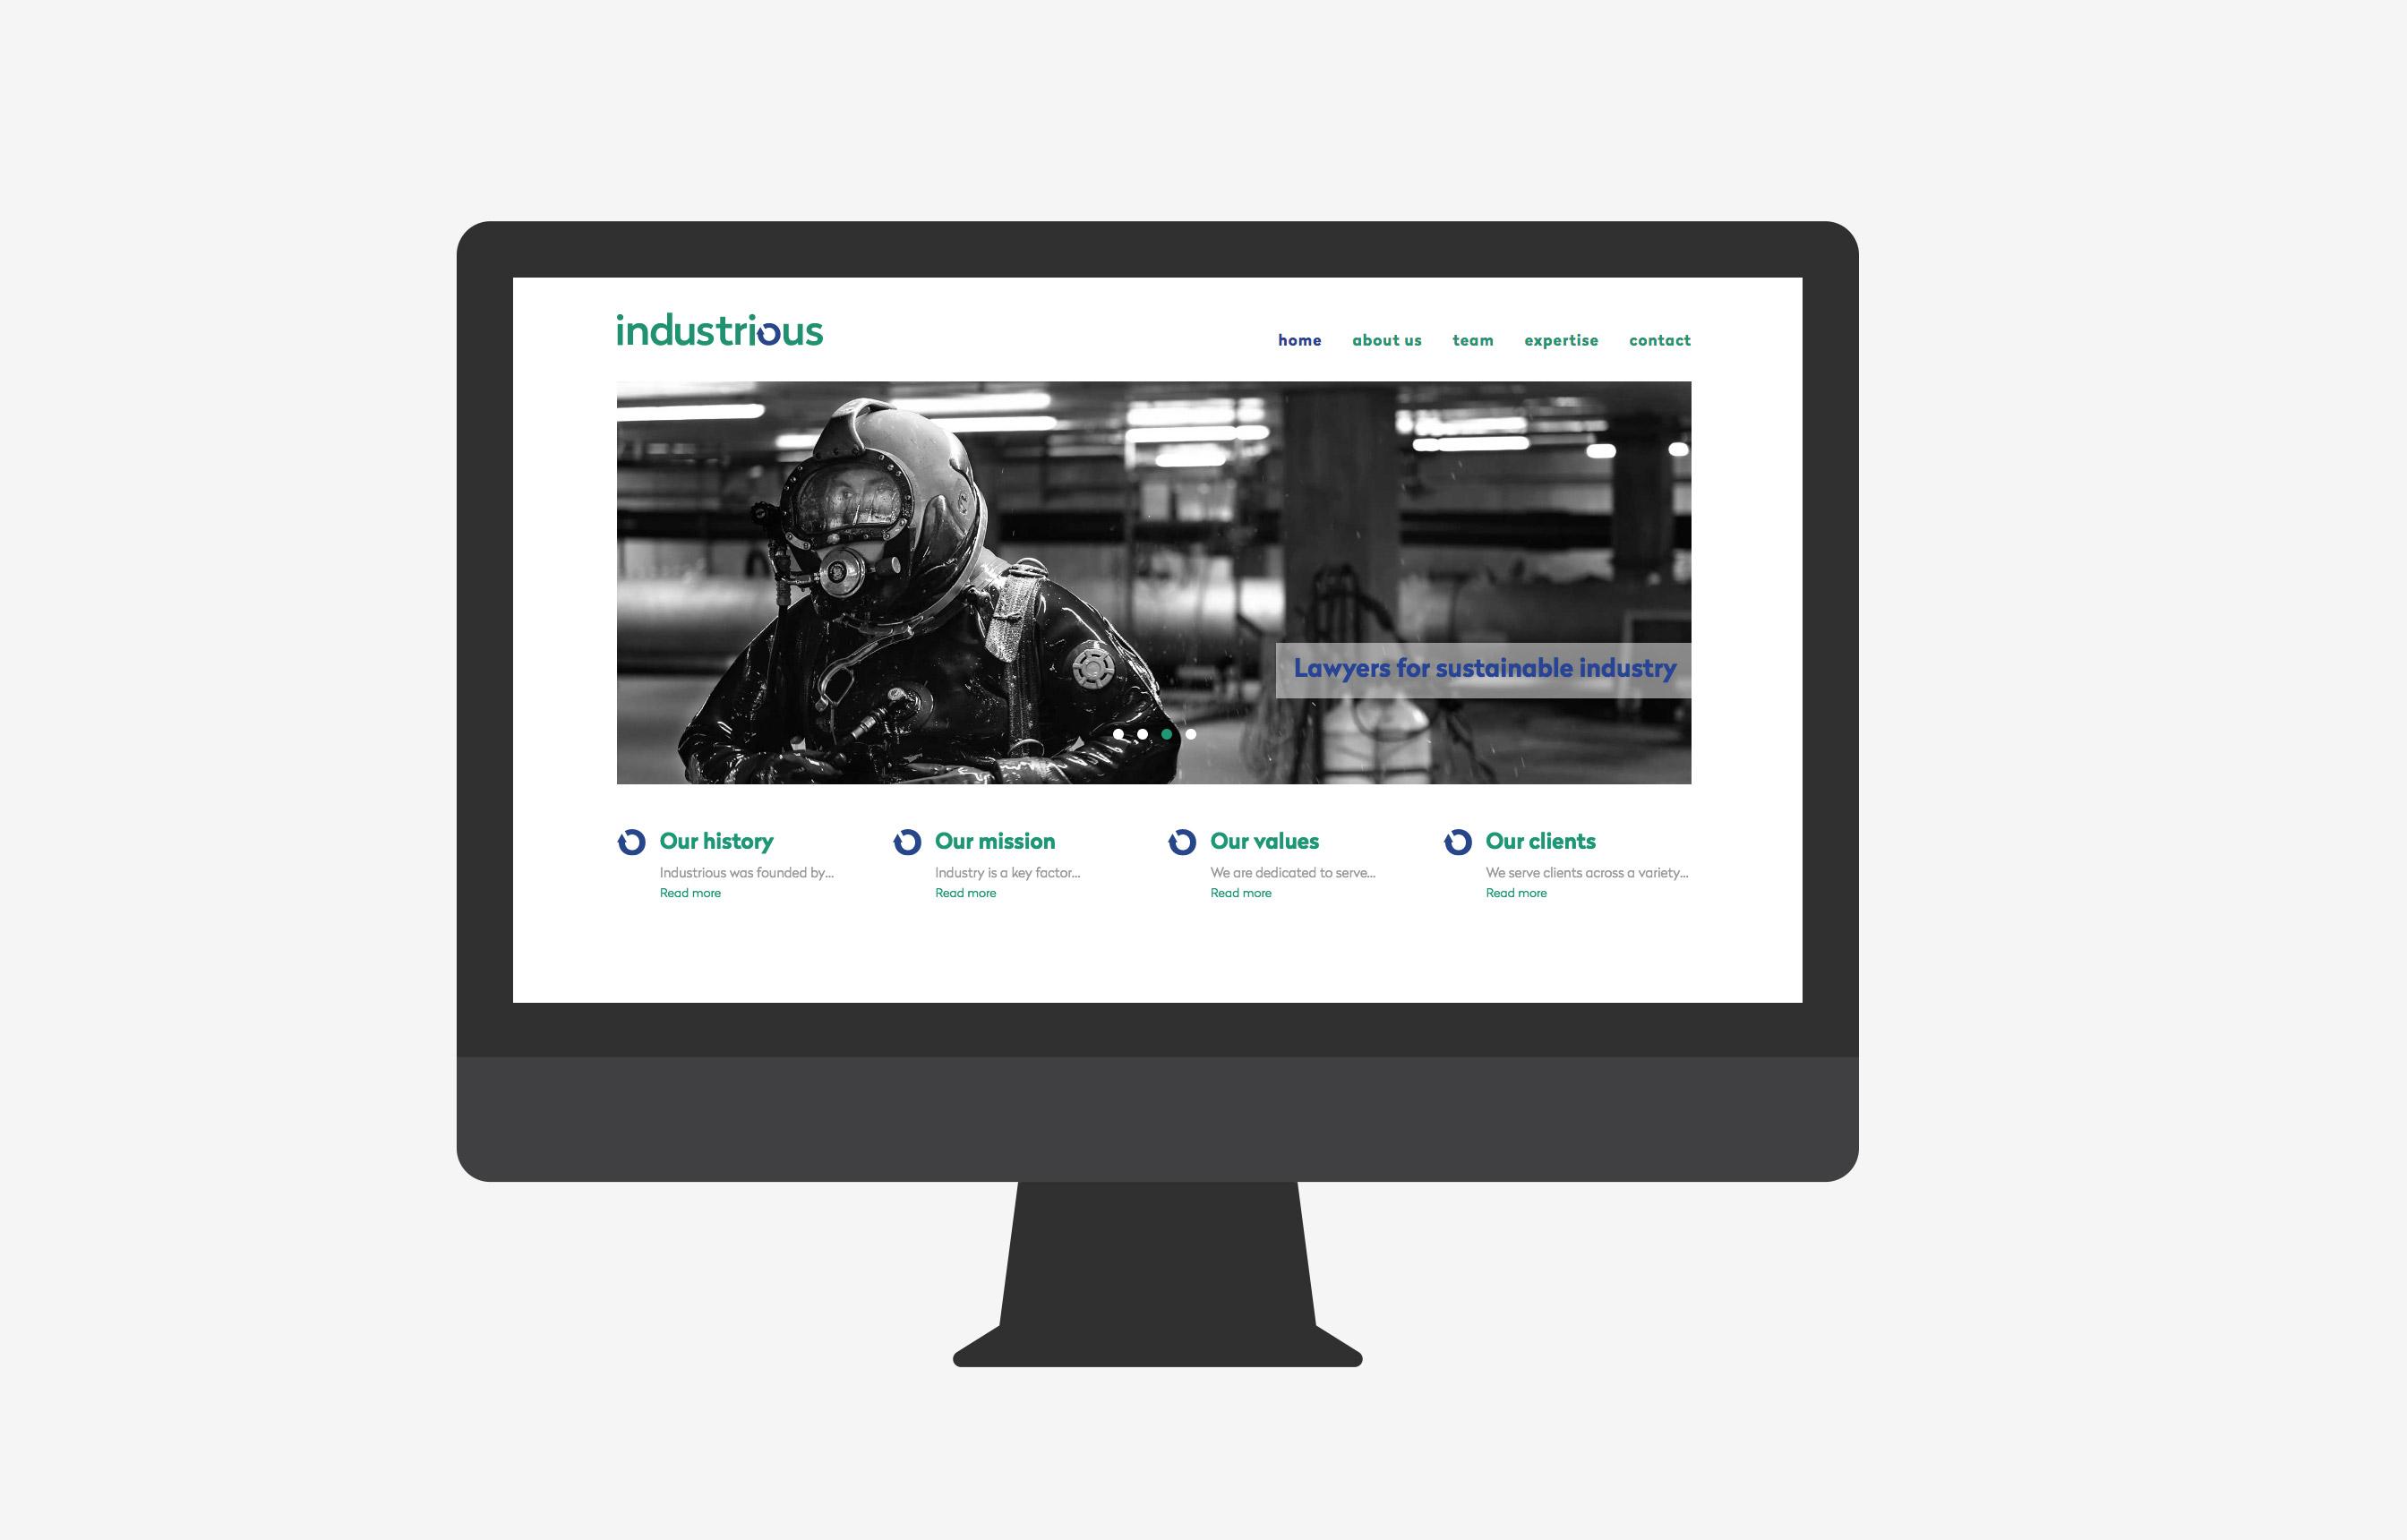 02-industrious-pikteo-webdesign-graphic-design-freelance-paris-bruxelles-londres